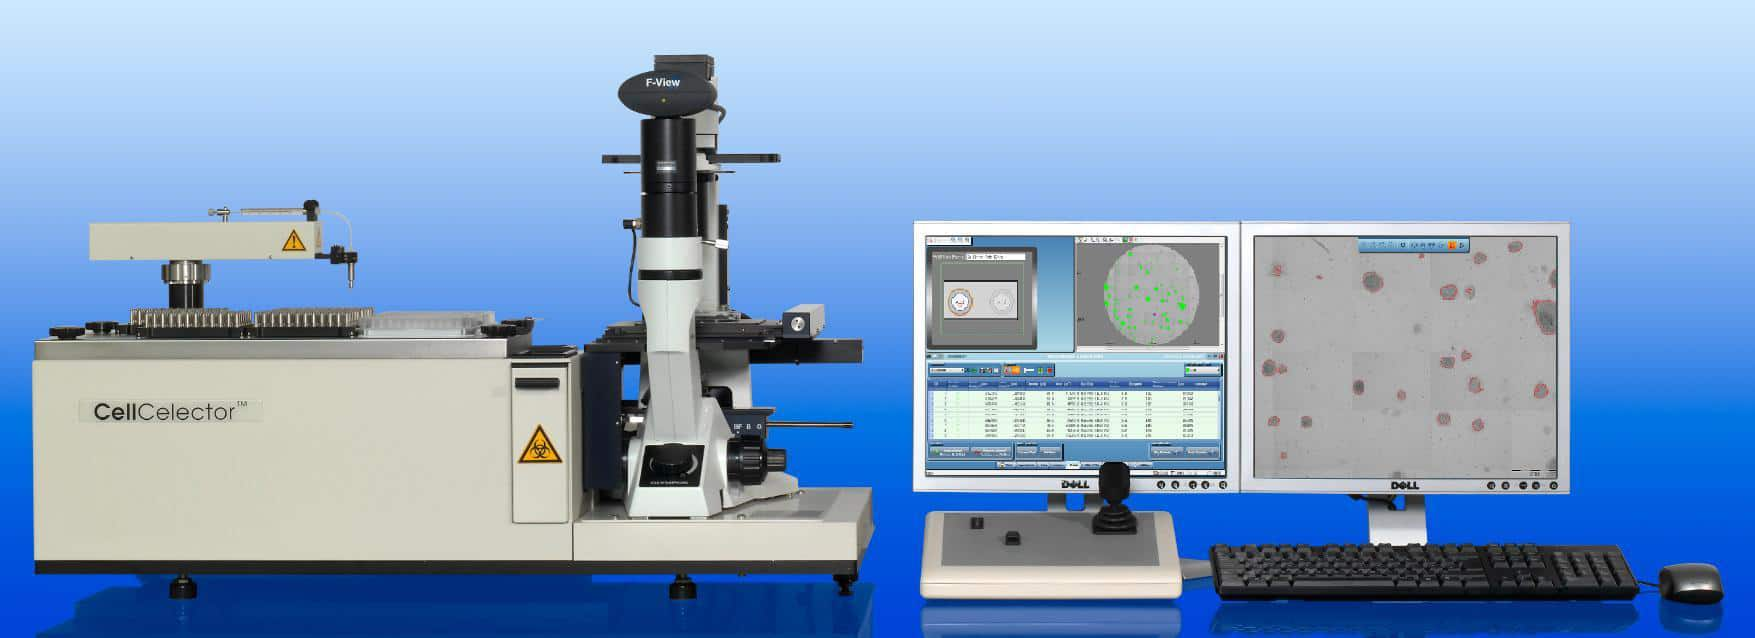 Aviso Cell Selector